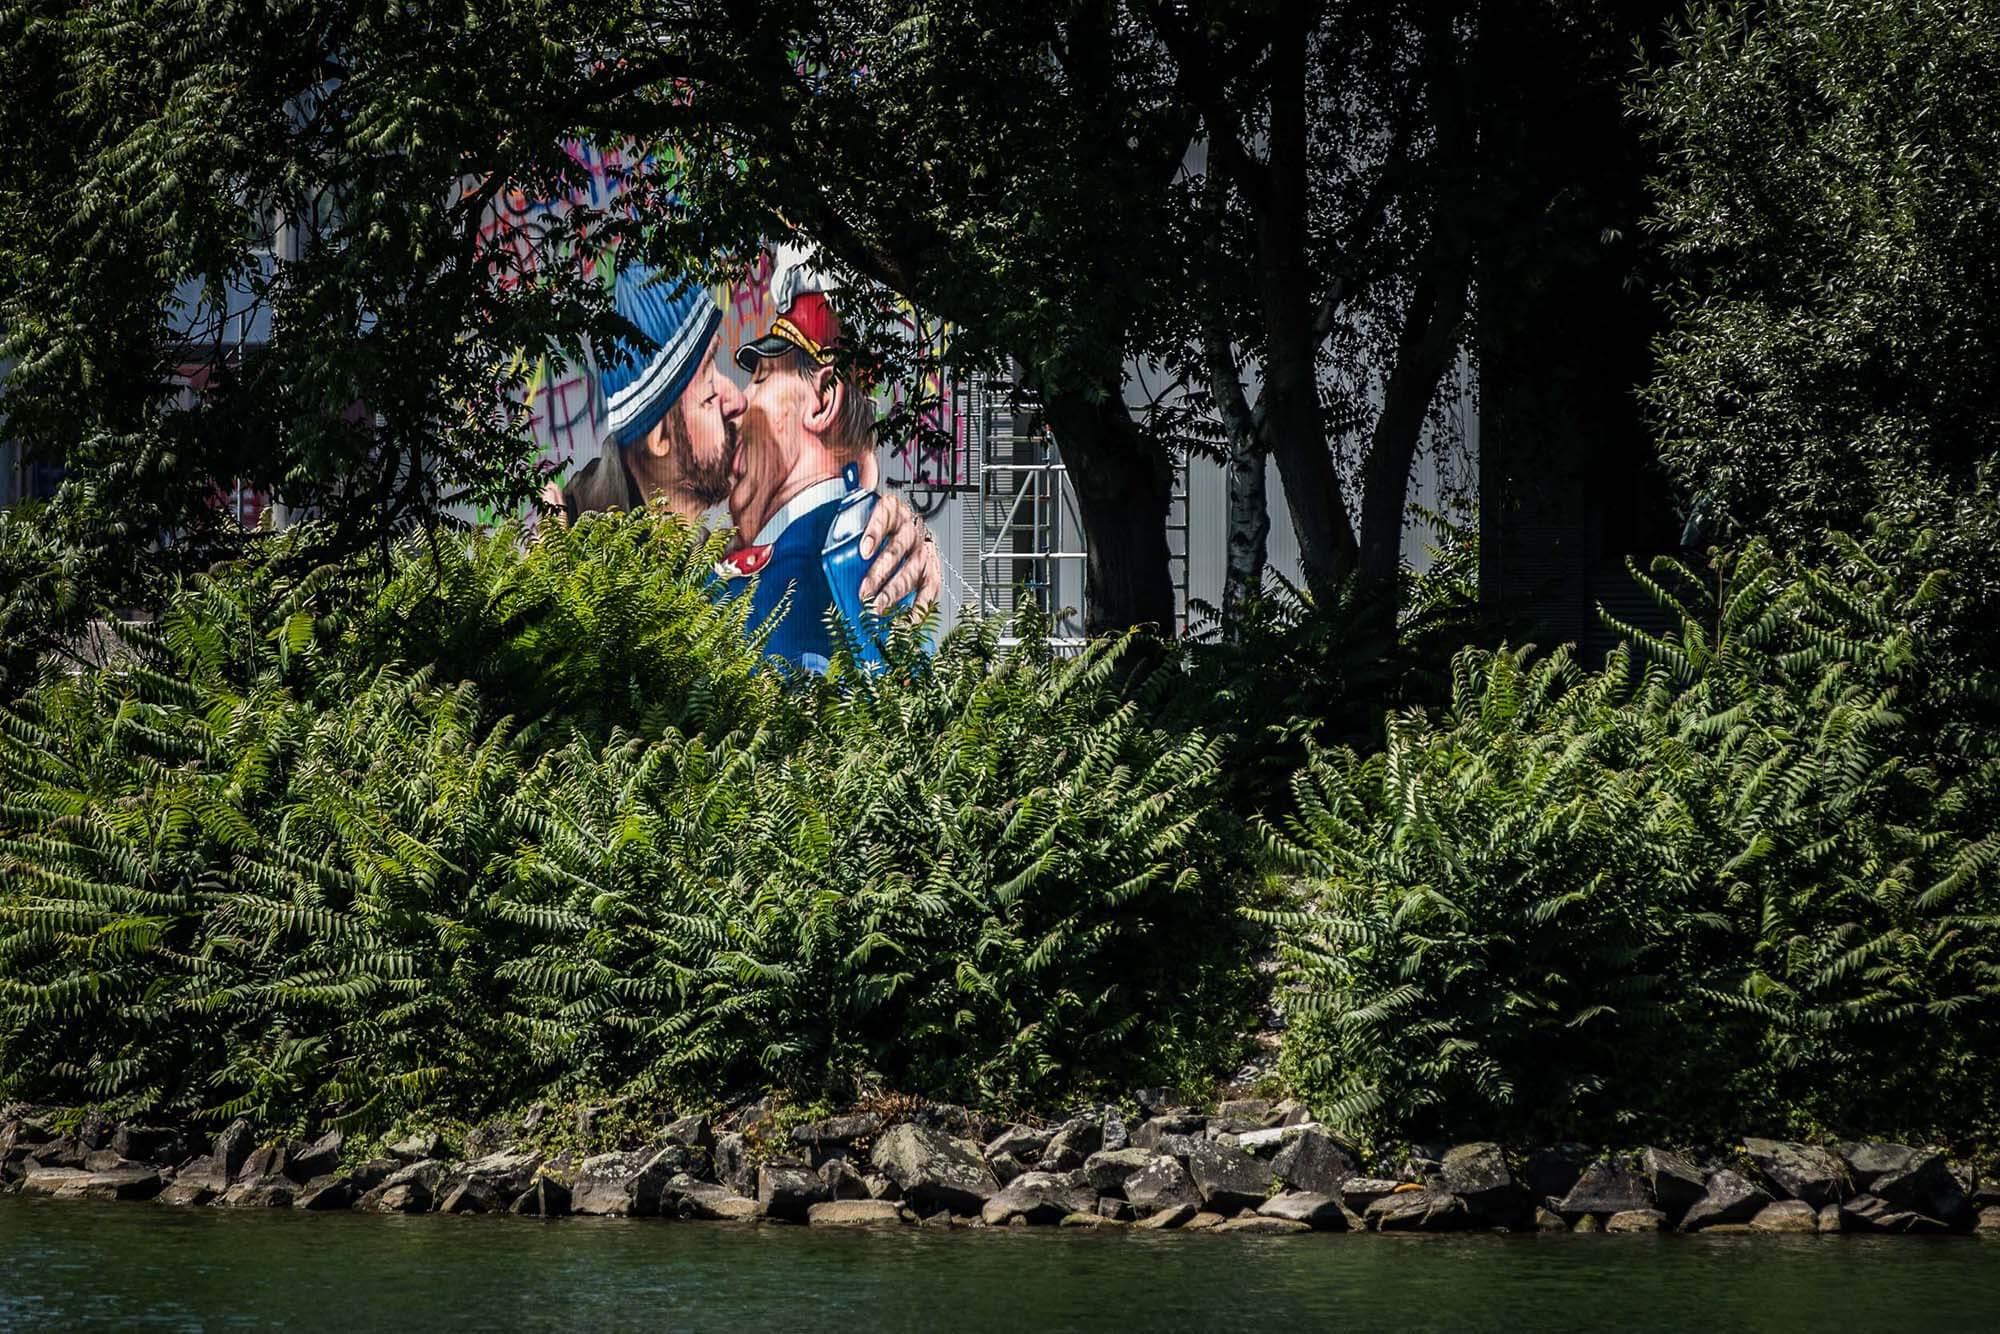 mural harbor graffiti erich willner shed gerhard haderer linz flap photography fotograf philipp greindl photographer